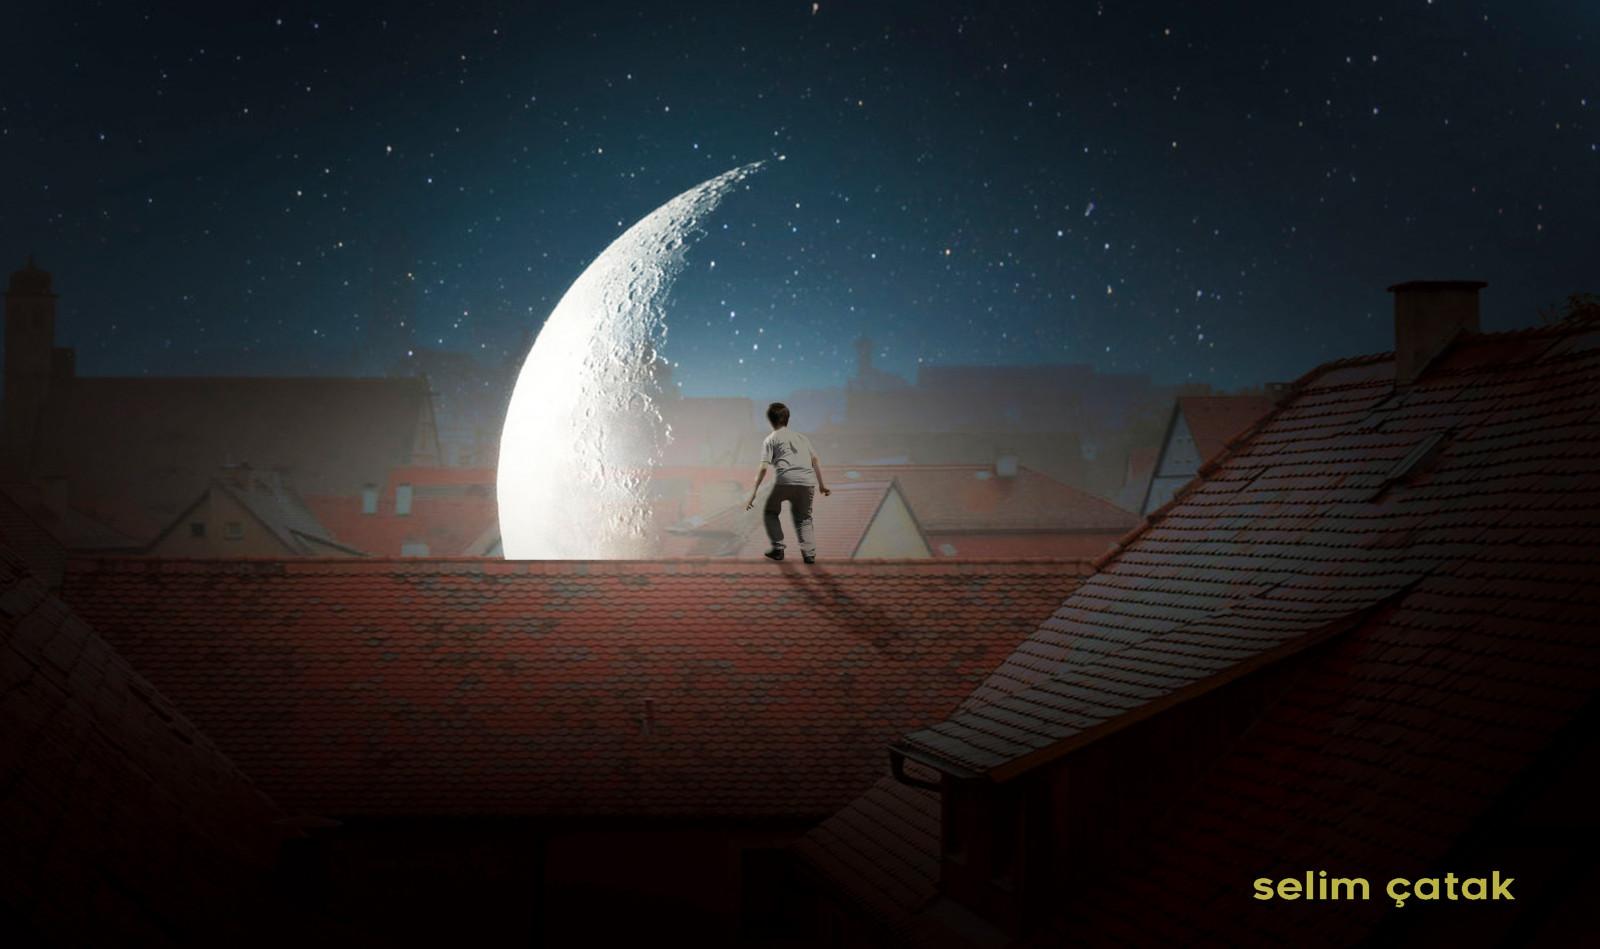 картинки ночь крыша луна скандалом